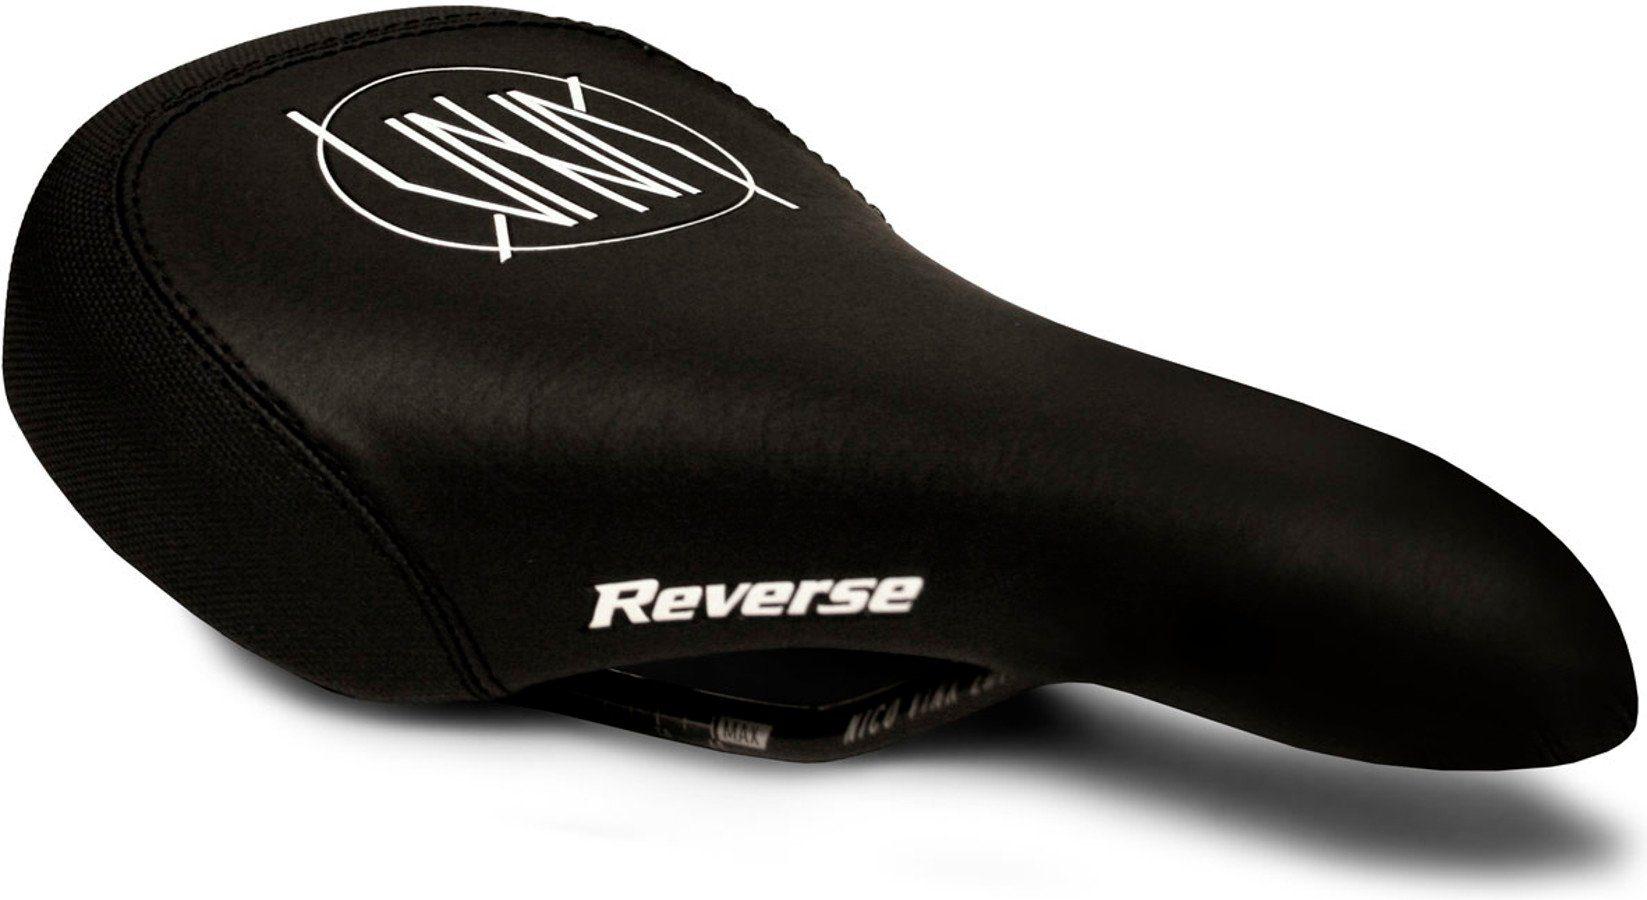 Reverse Fahrradsattel »Nico Vink-Signature Series Sattel«